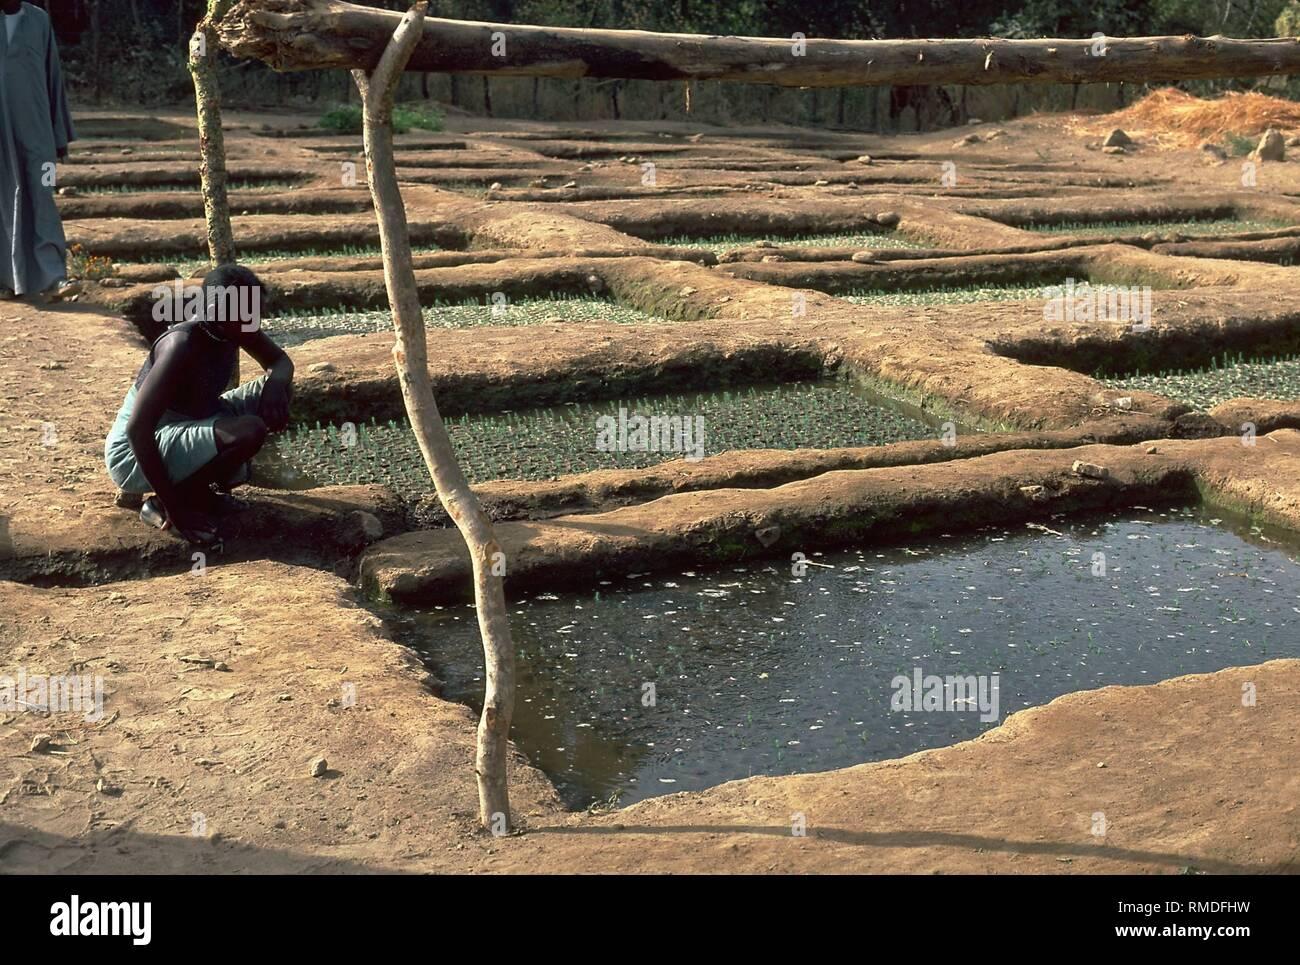 Water Beds In A Nursery In Sudan Stock Photo Alamy